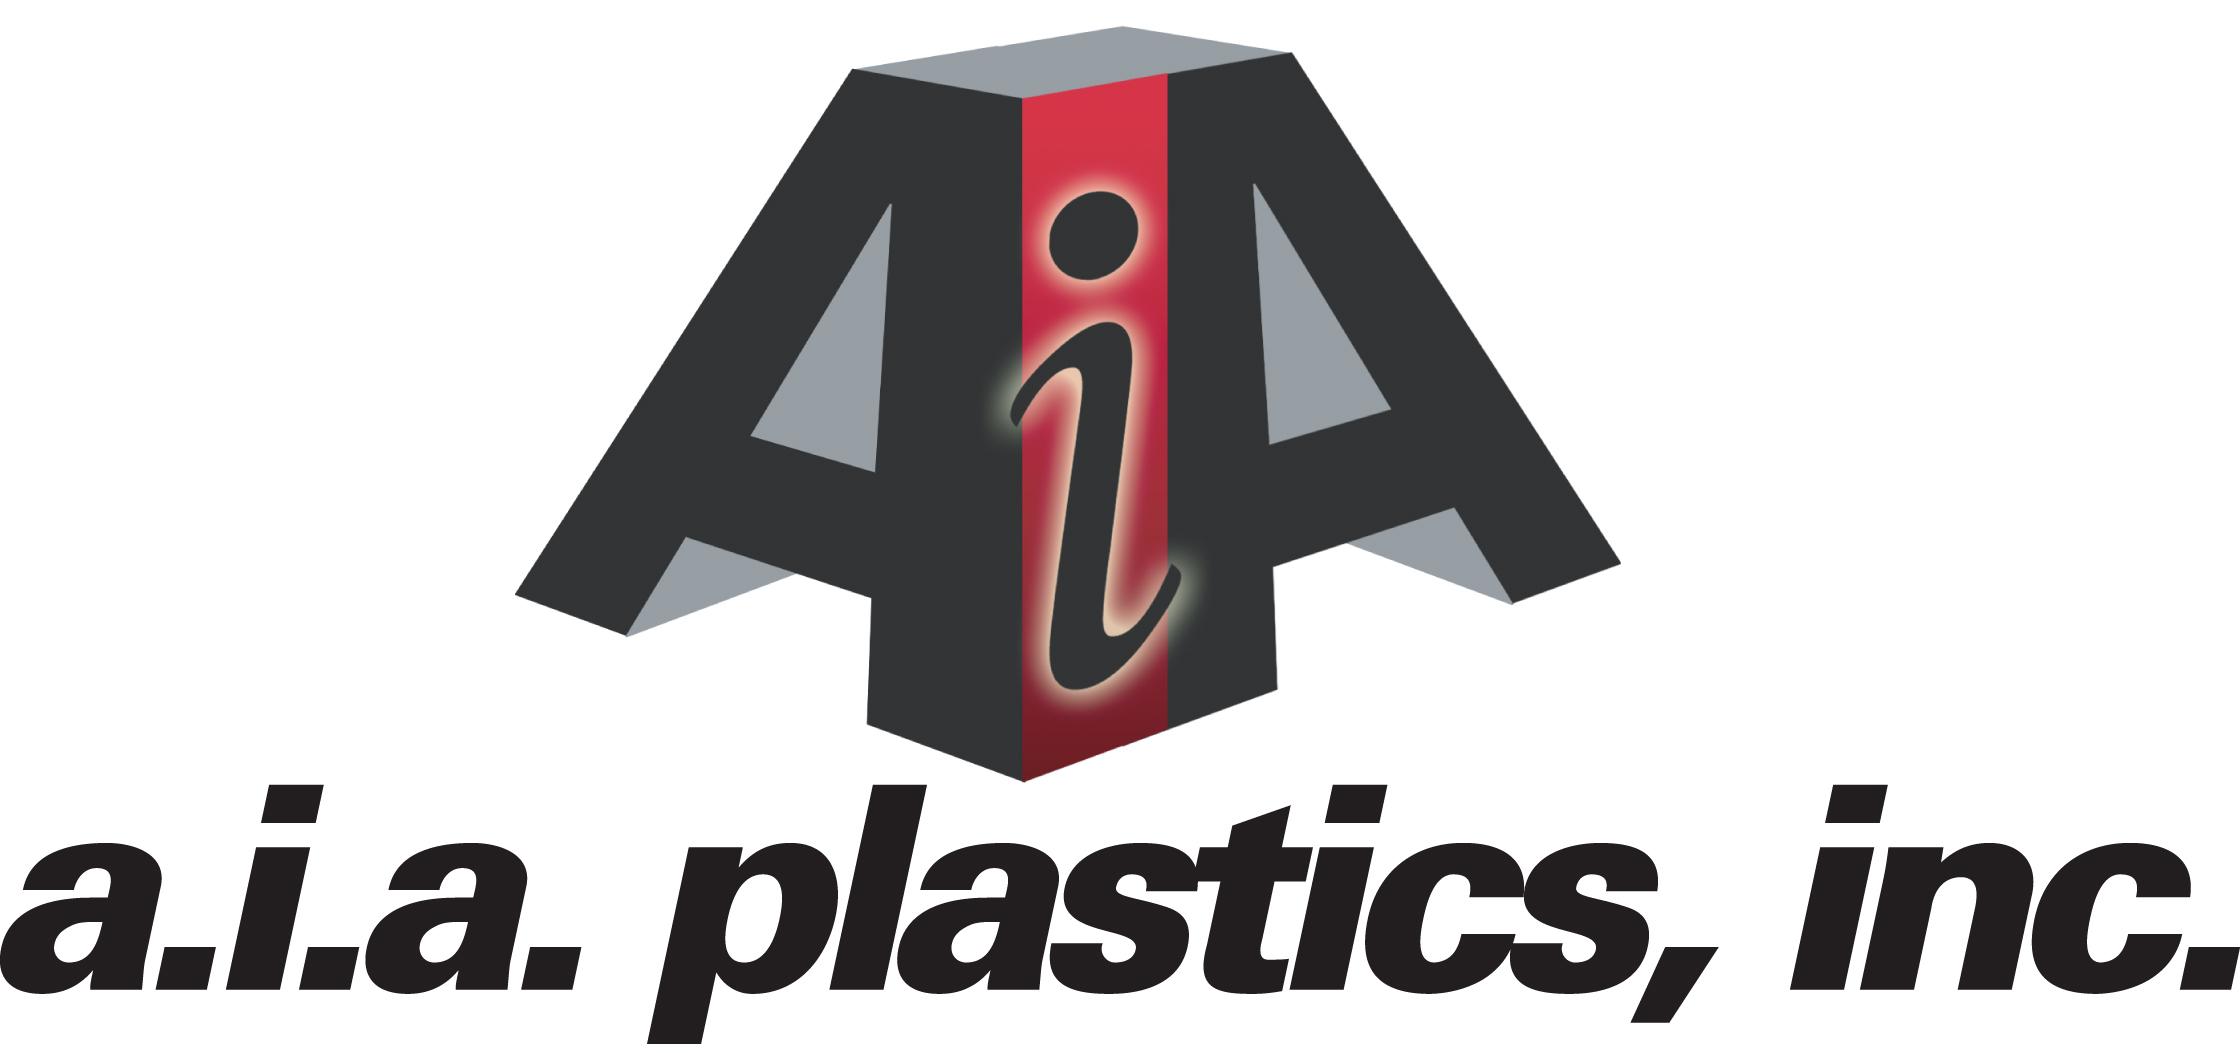 AIA Plastics, Inc.